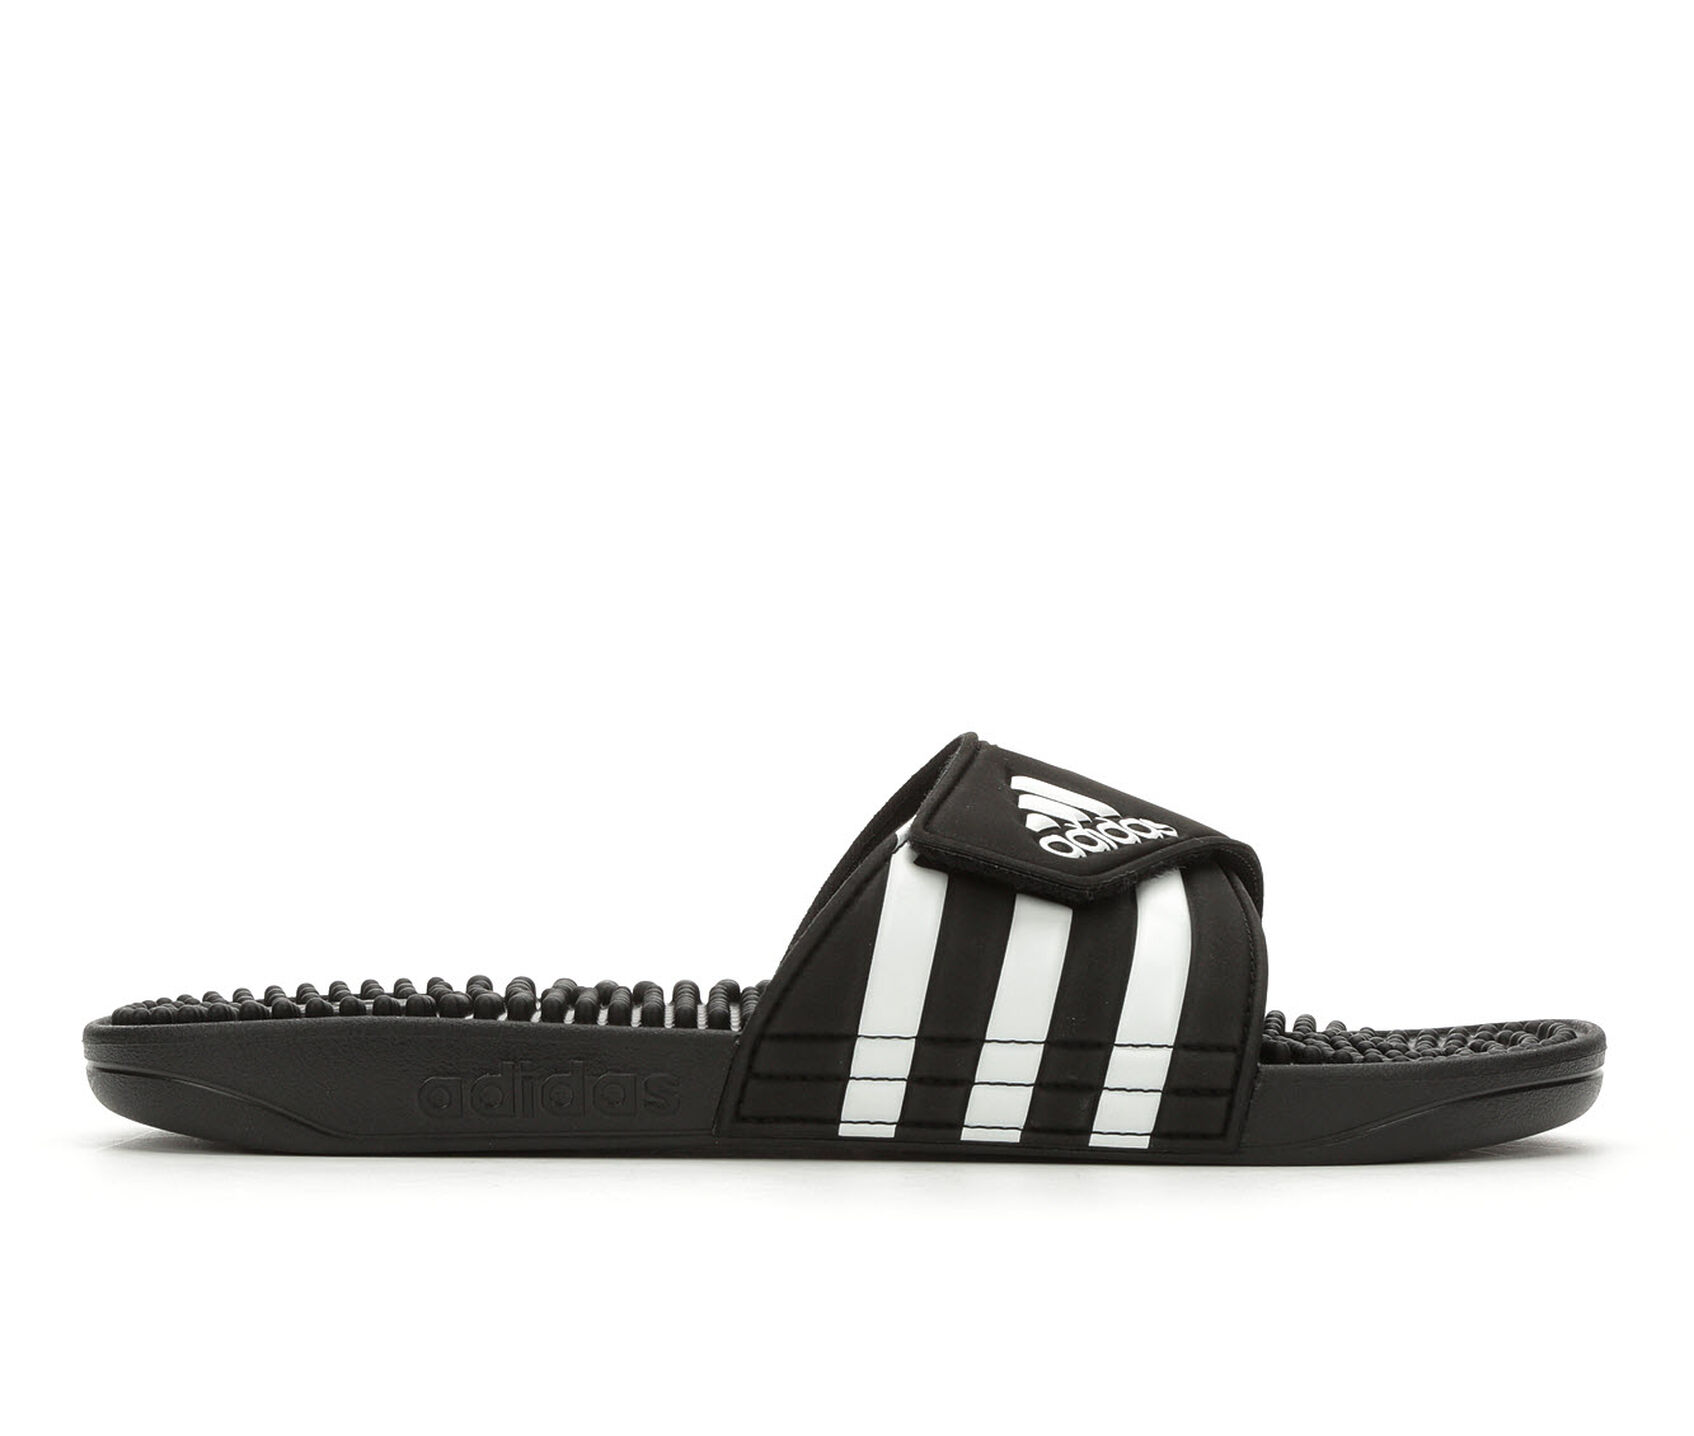 best website 45441 d8d63 Mens Adidas Adissage Sport Slides  Shoe Carnival